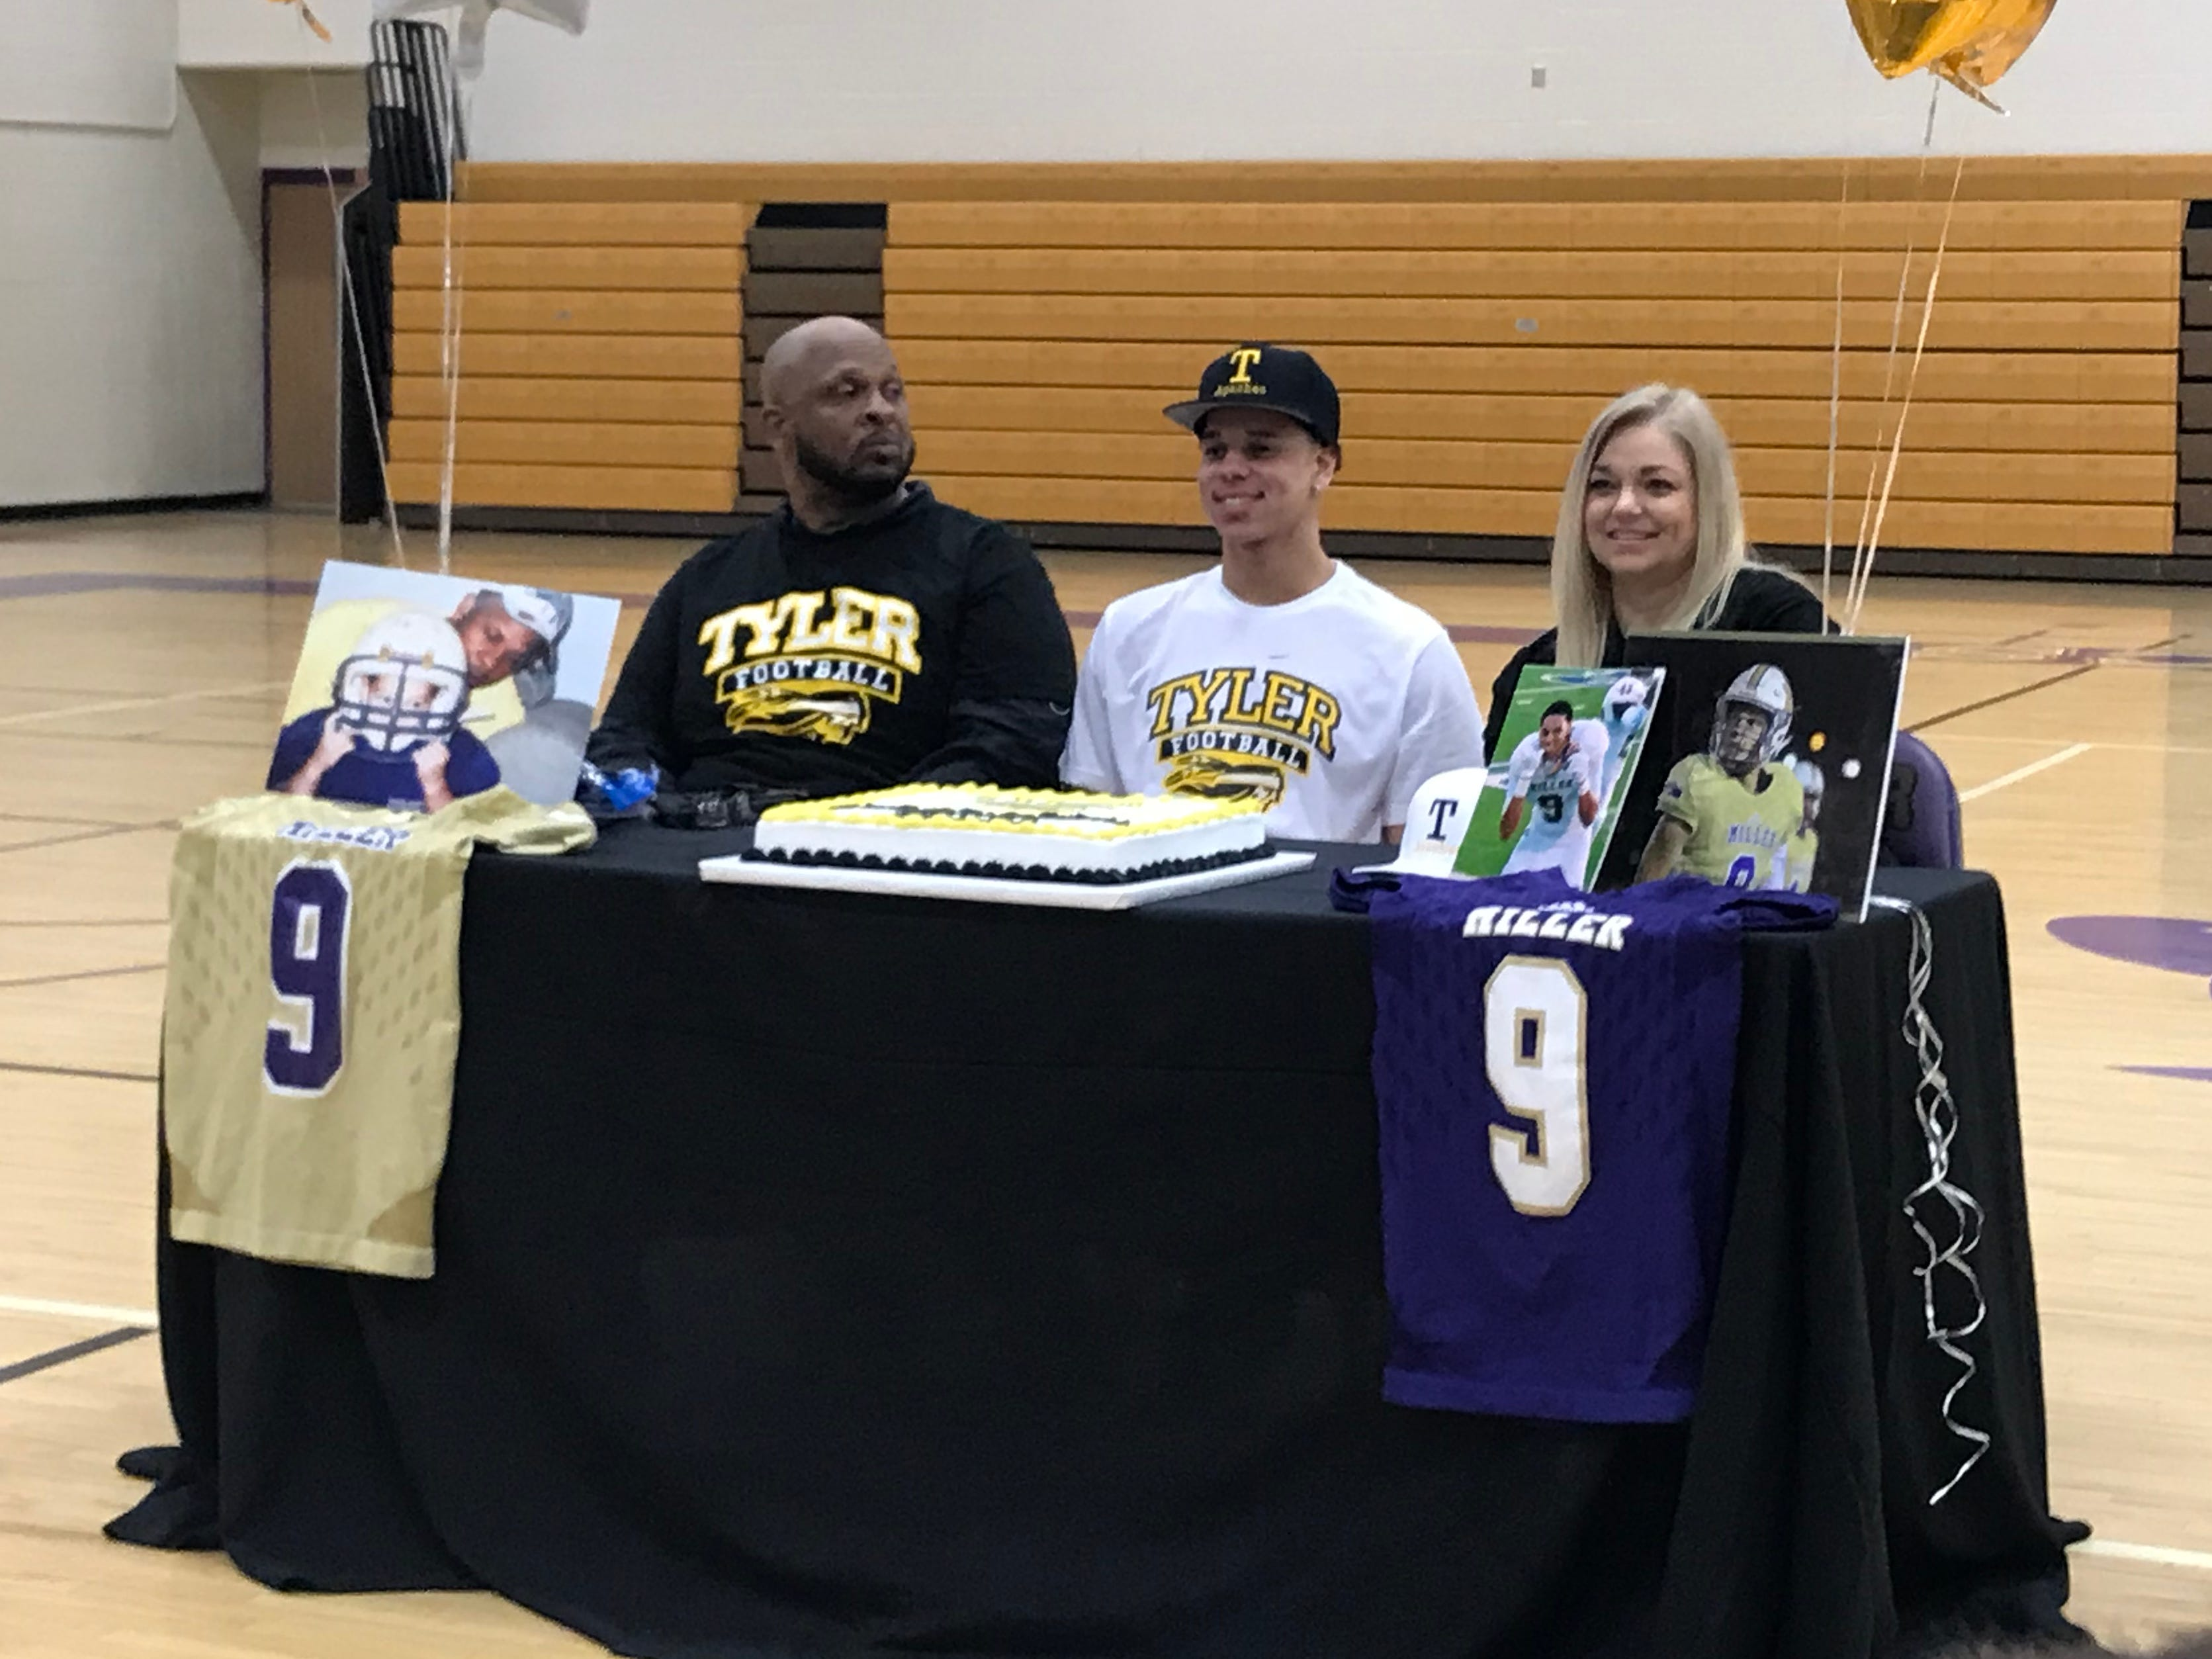 Miller defensive lineman Xxavier Watson signed with Tyler Junior College on Wednesday, Feb. 6, 2019 at Miller's Pete Ragus Gymnasium.